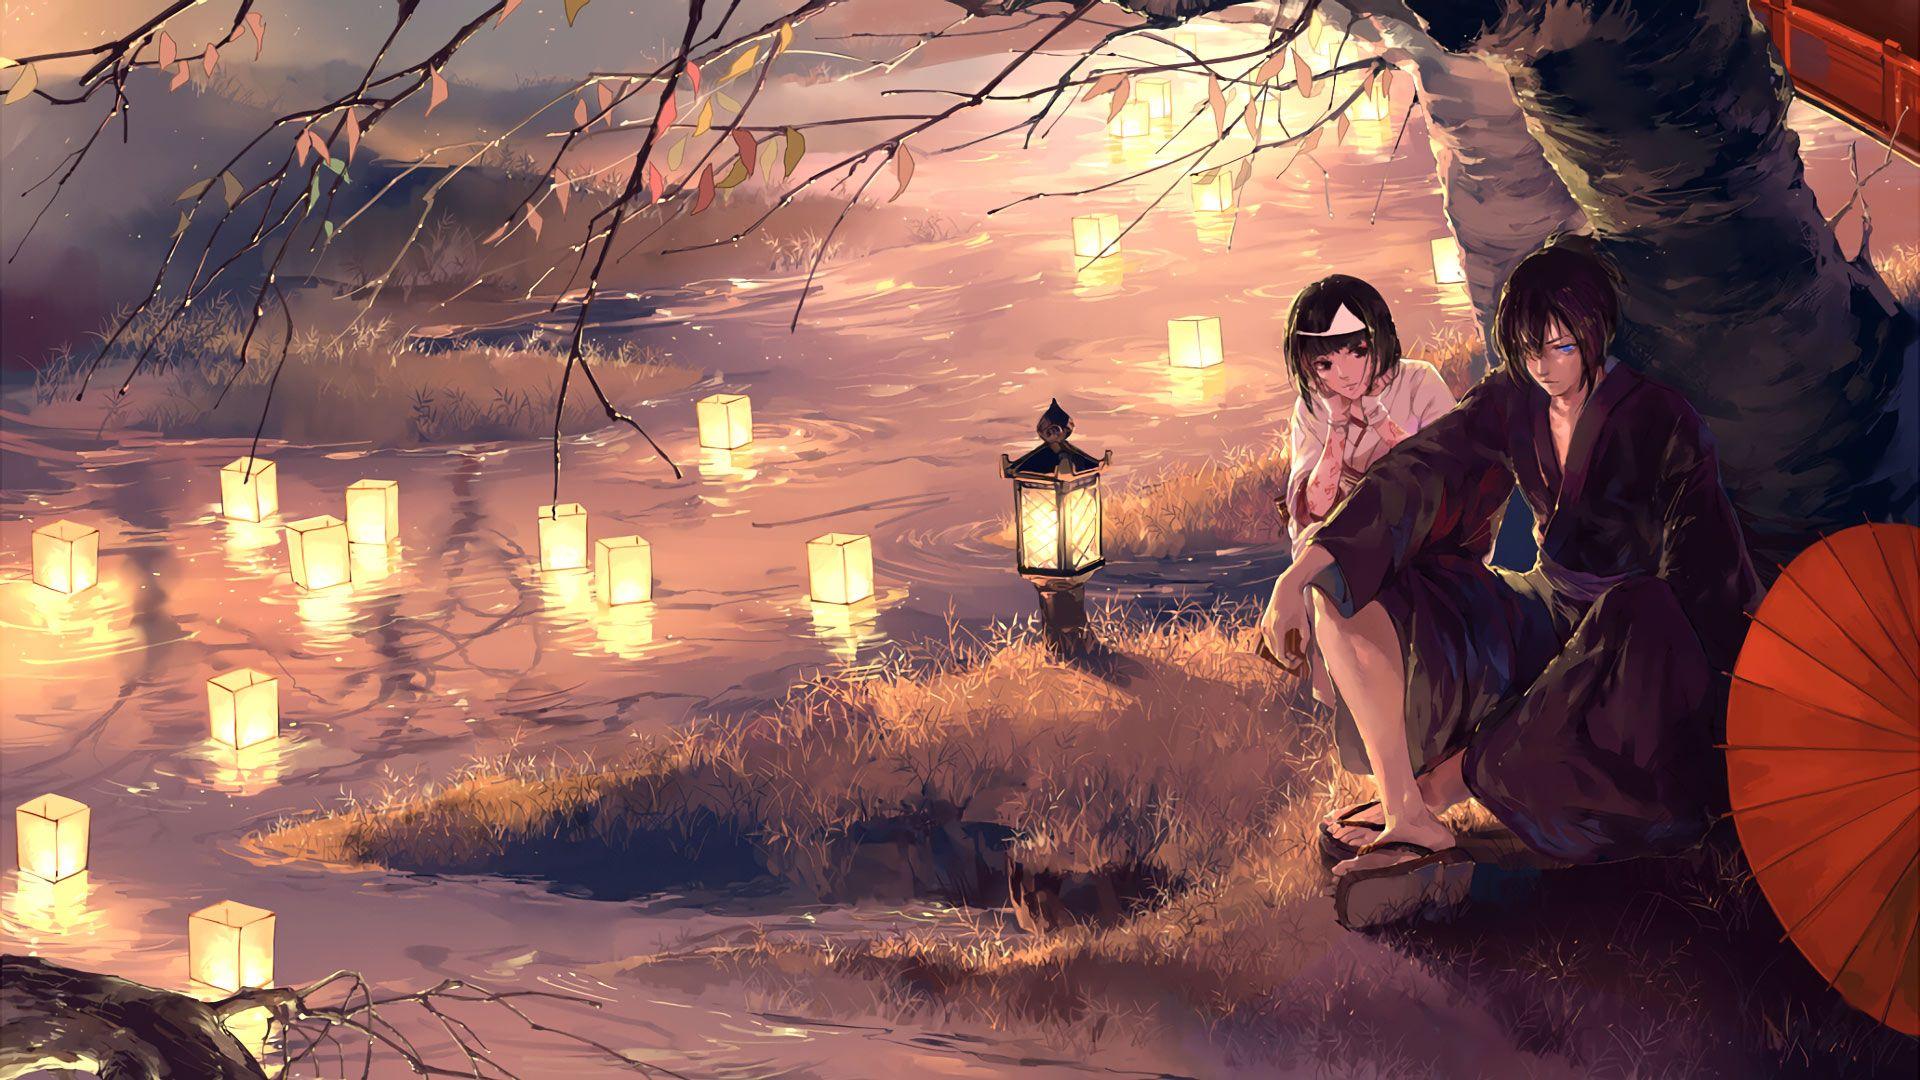 Free Anime Candle Lights Artwork Anime Computer Desktop Hd Wallpapers Anime Pictures Anime Images Yato Noragami Noragami Anime Anime Wallpaper